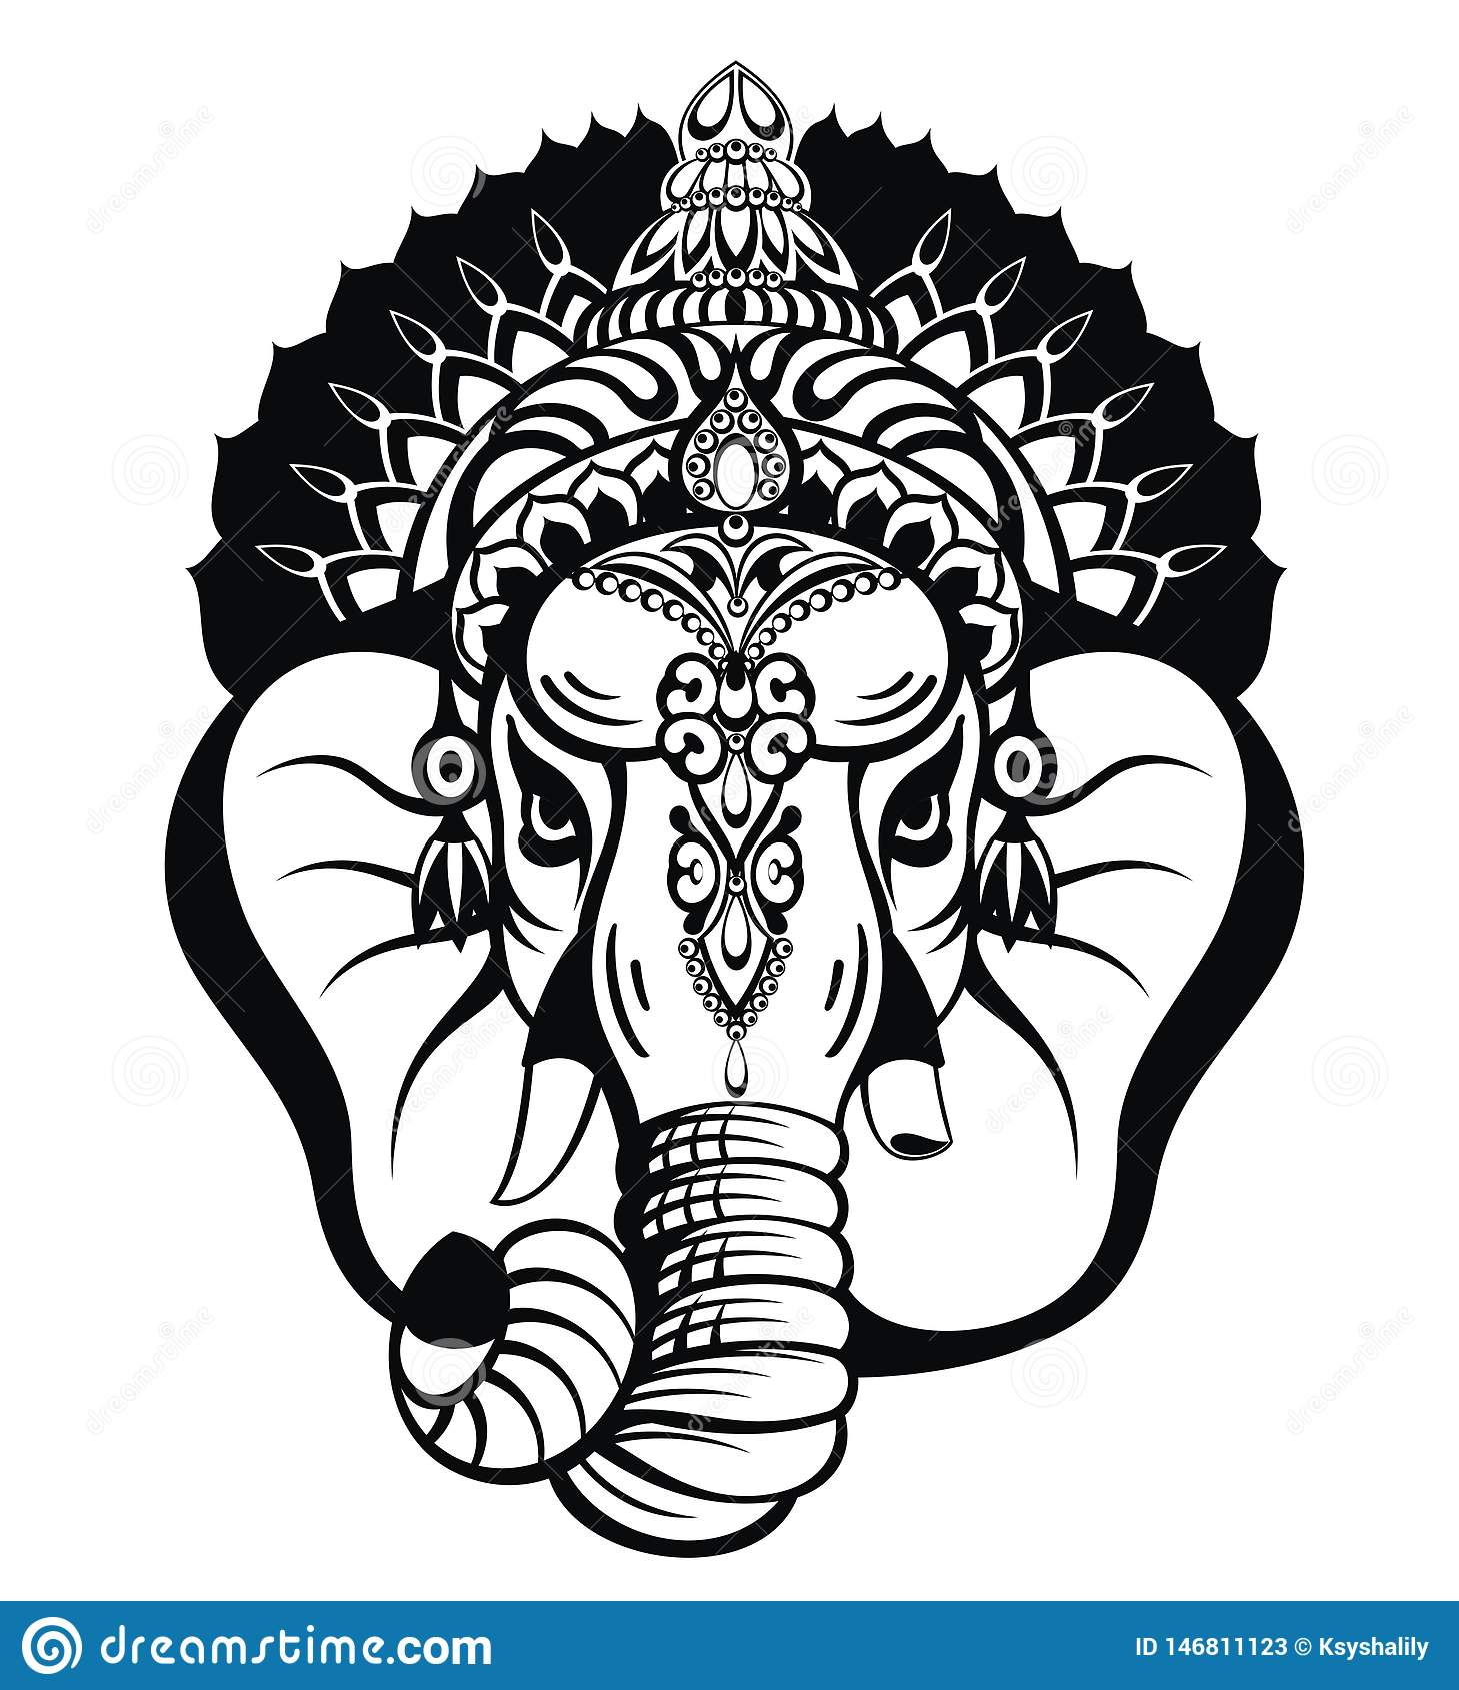 Lord Ganesha Illustration Of Lord Ganpati Background For Ganesh Chaturthi Festival Of India Stock Vector Illustration Of Ganesha Lord 146811123